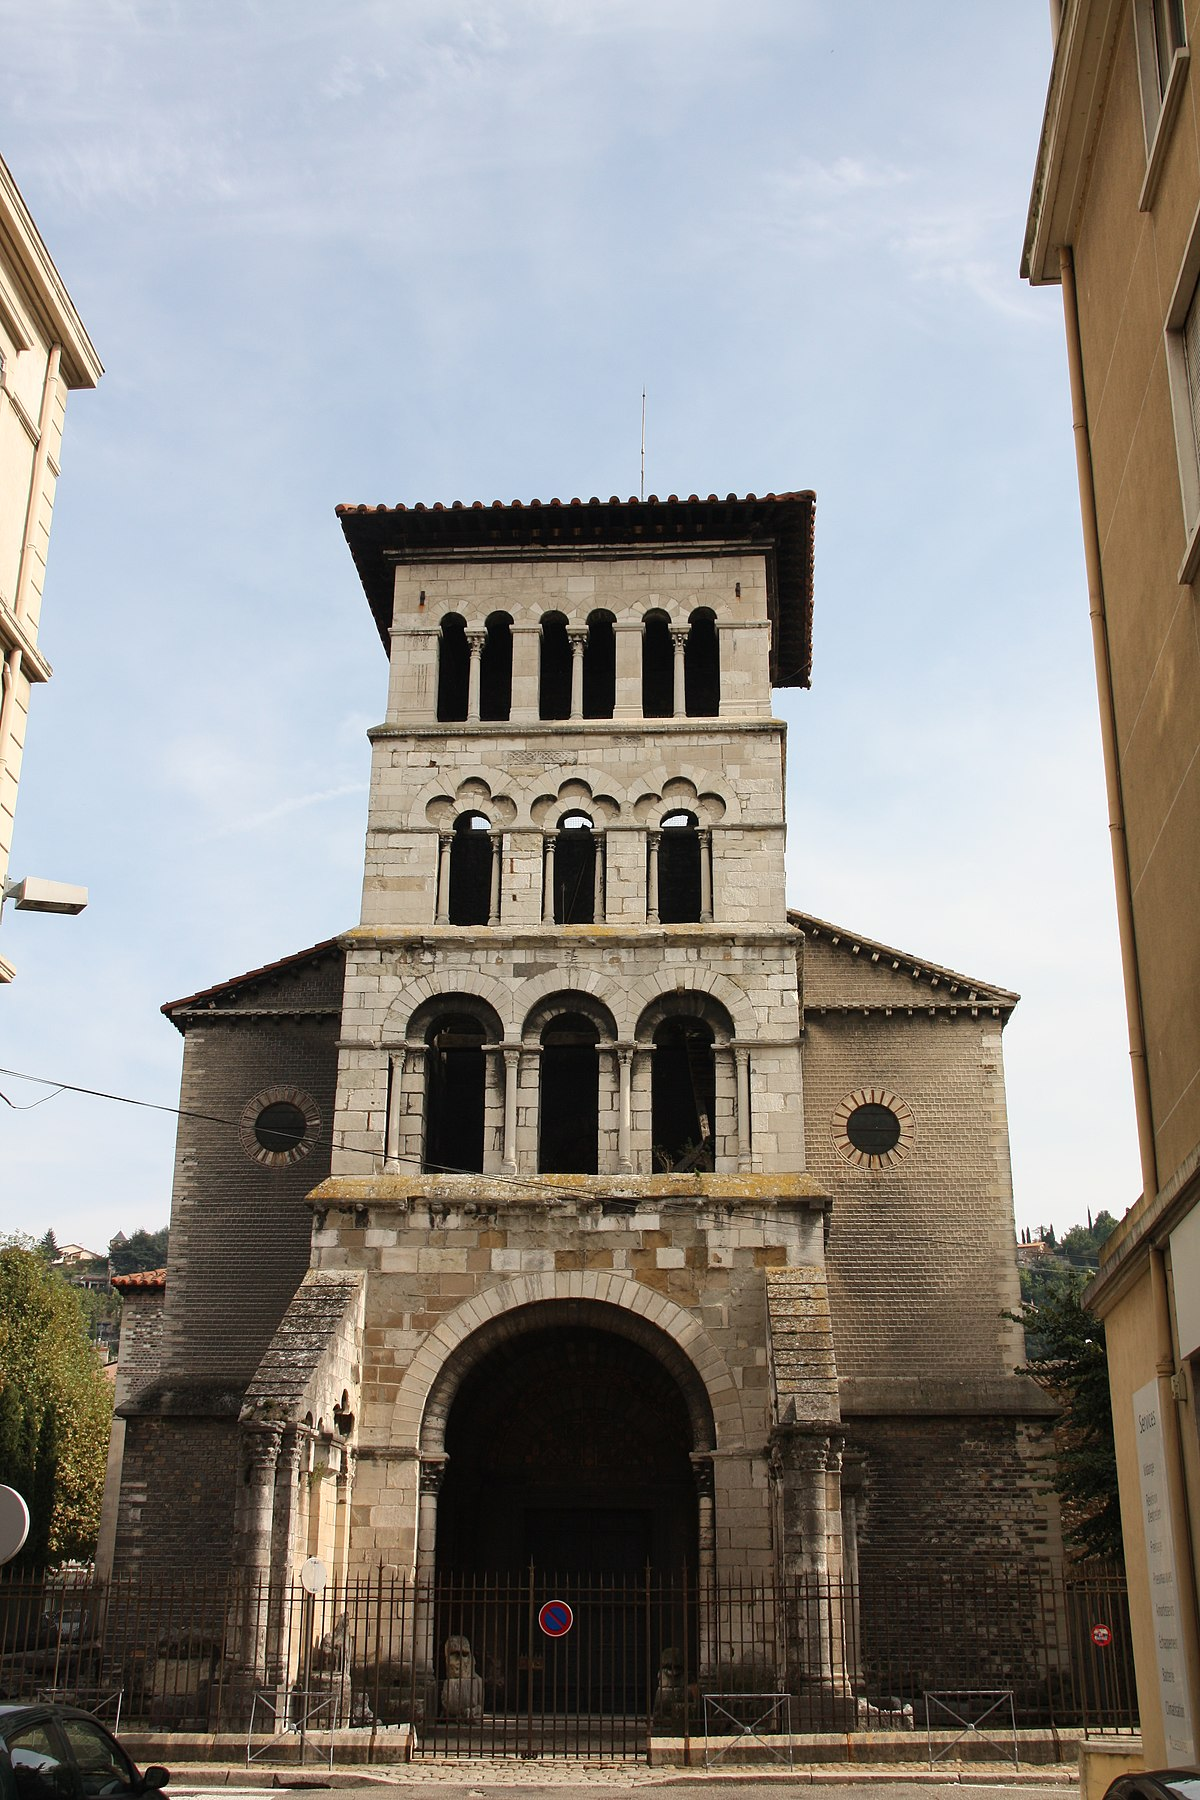 Saint Peters church, Vienne (Isère) - Wikipedia